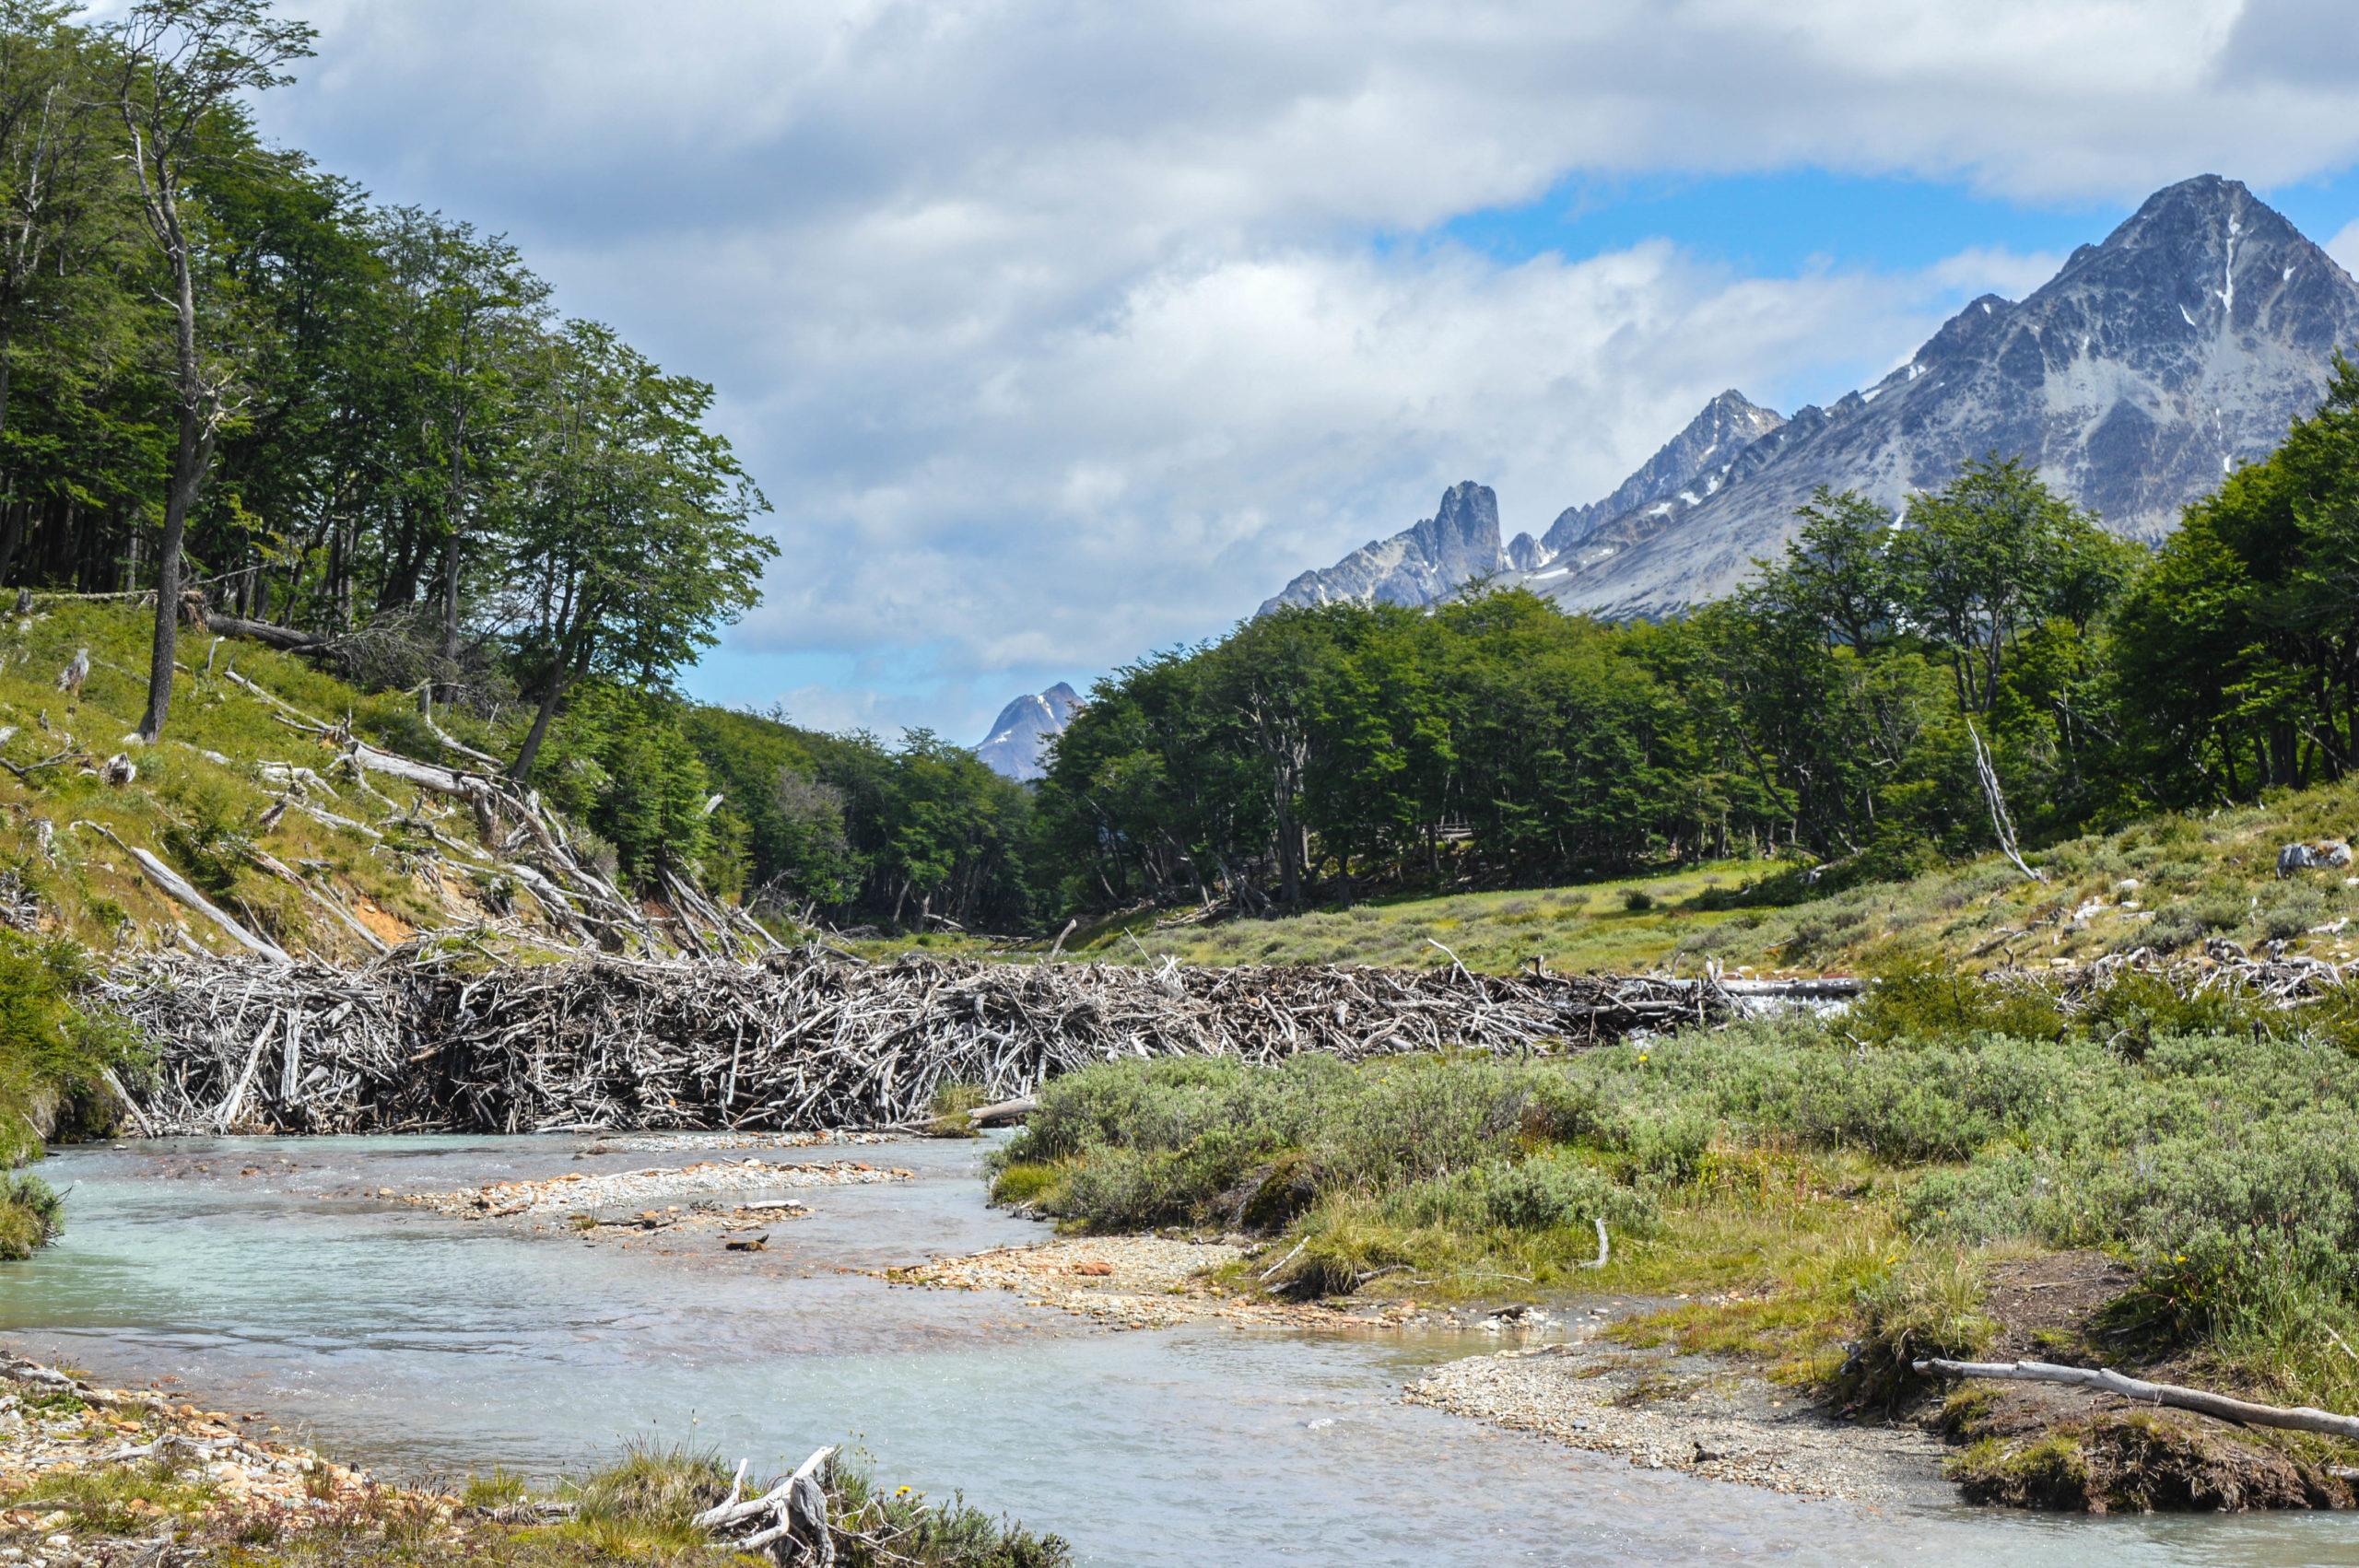 paysage, barrage de castor